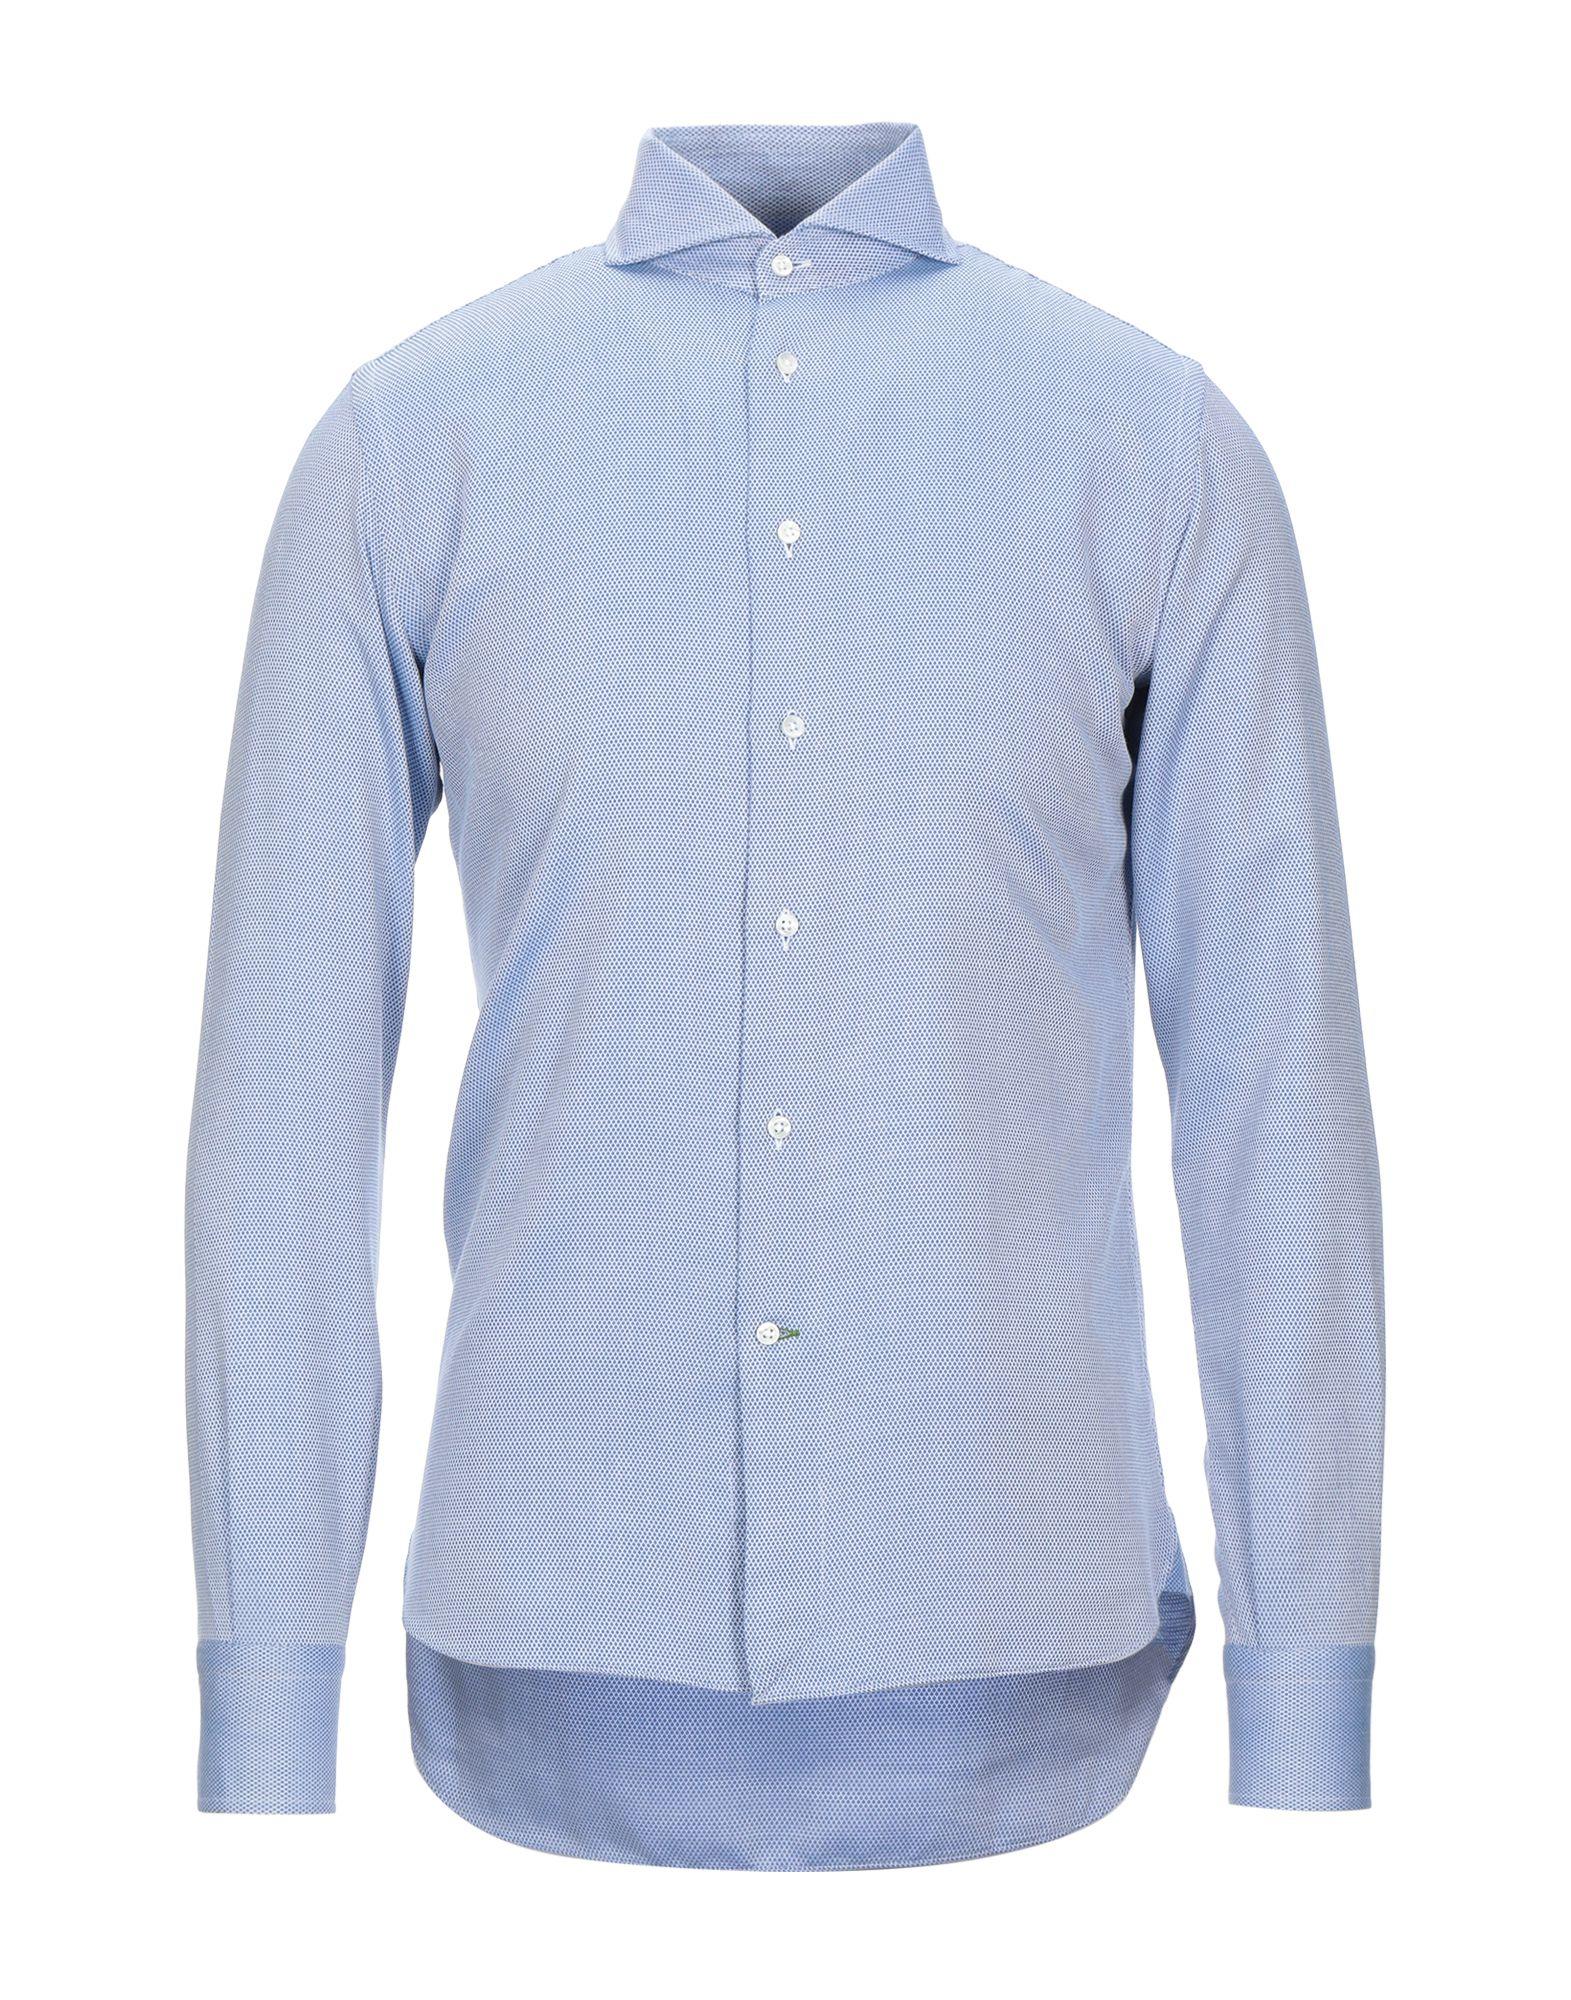 BRANCACCIO Shirts - Item 38938146